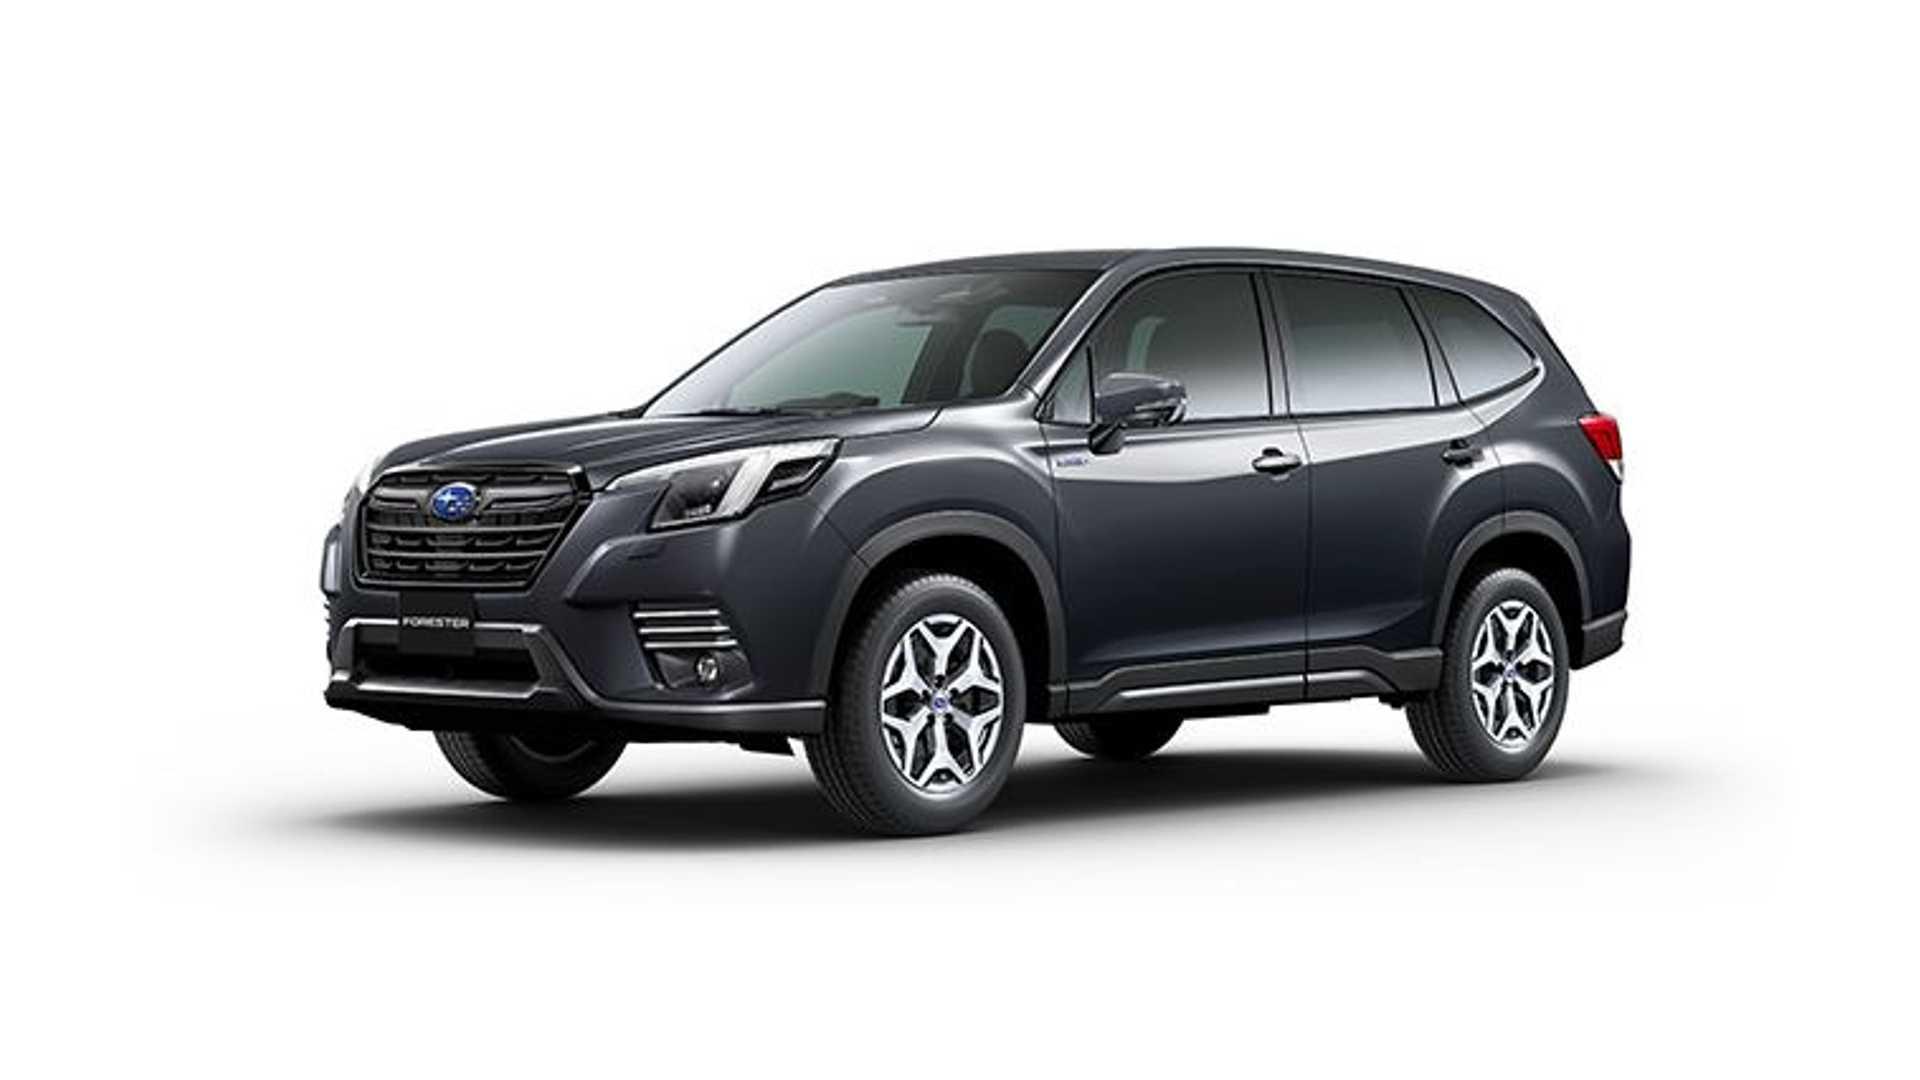 Subaru-Forester-facelift-19